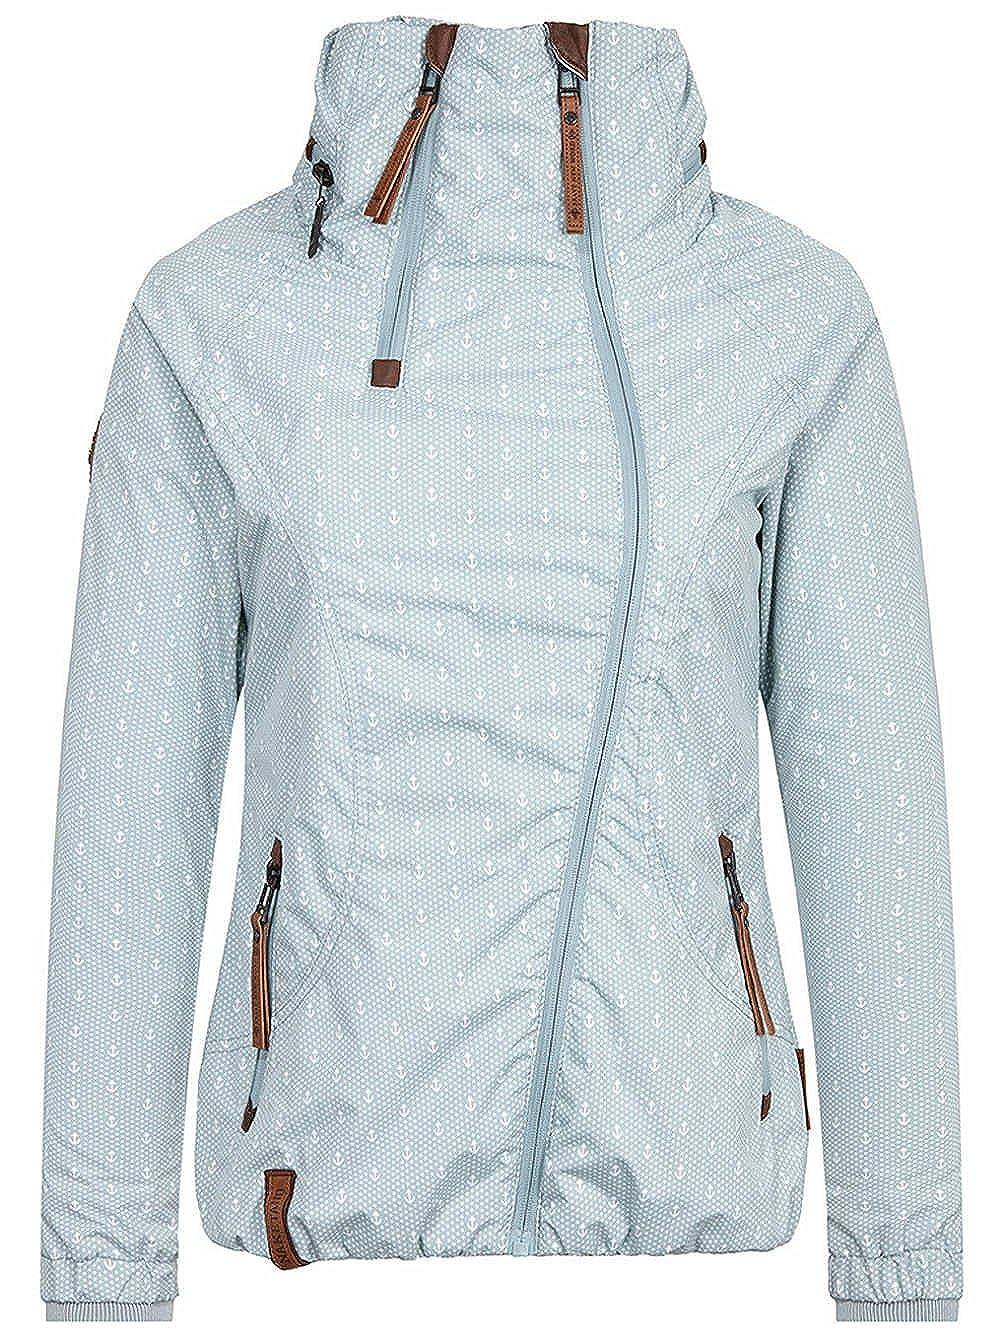 high quality Naketano Ej Du Geile Schnalle Jacket Anchor XXI